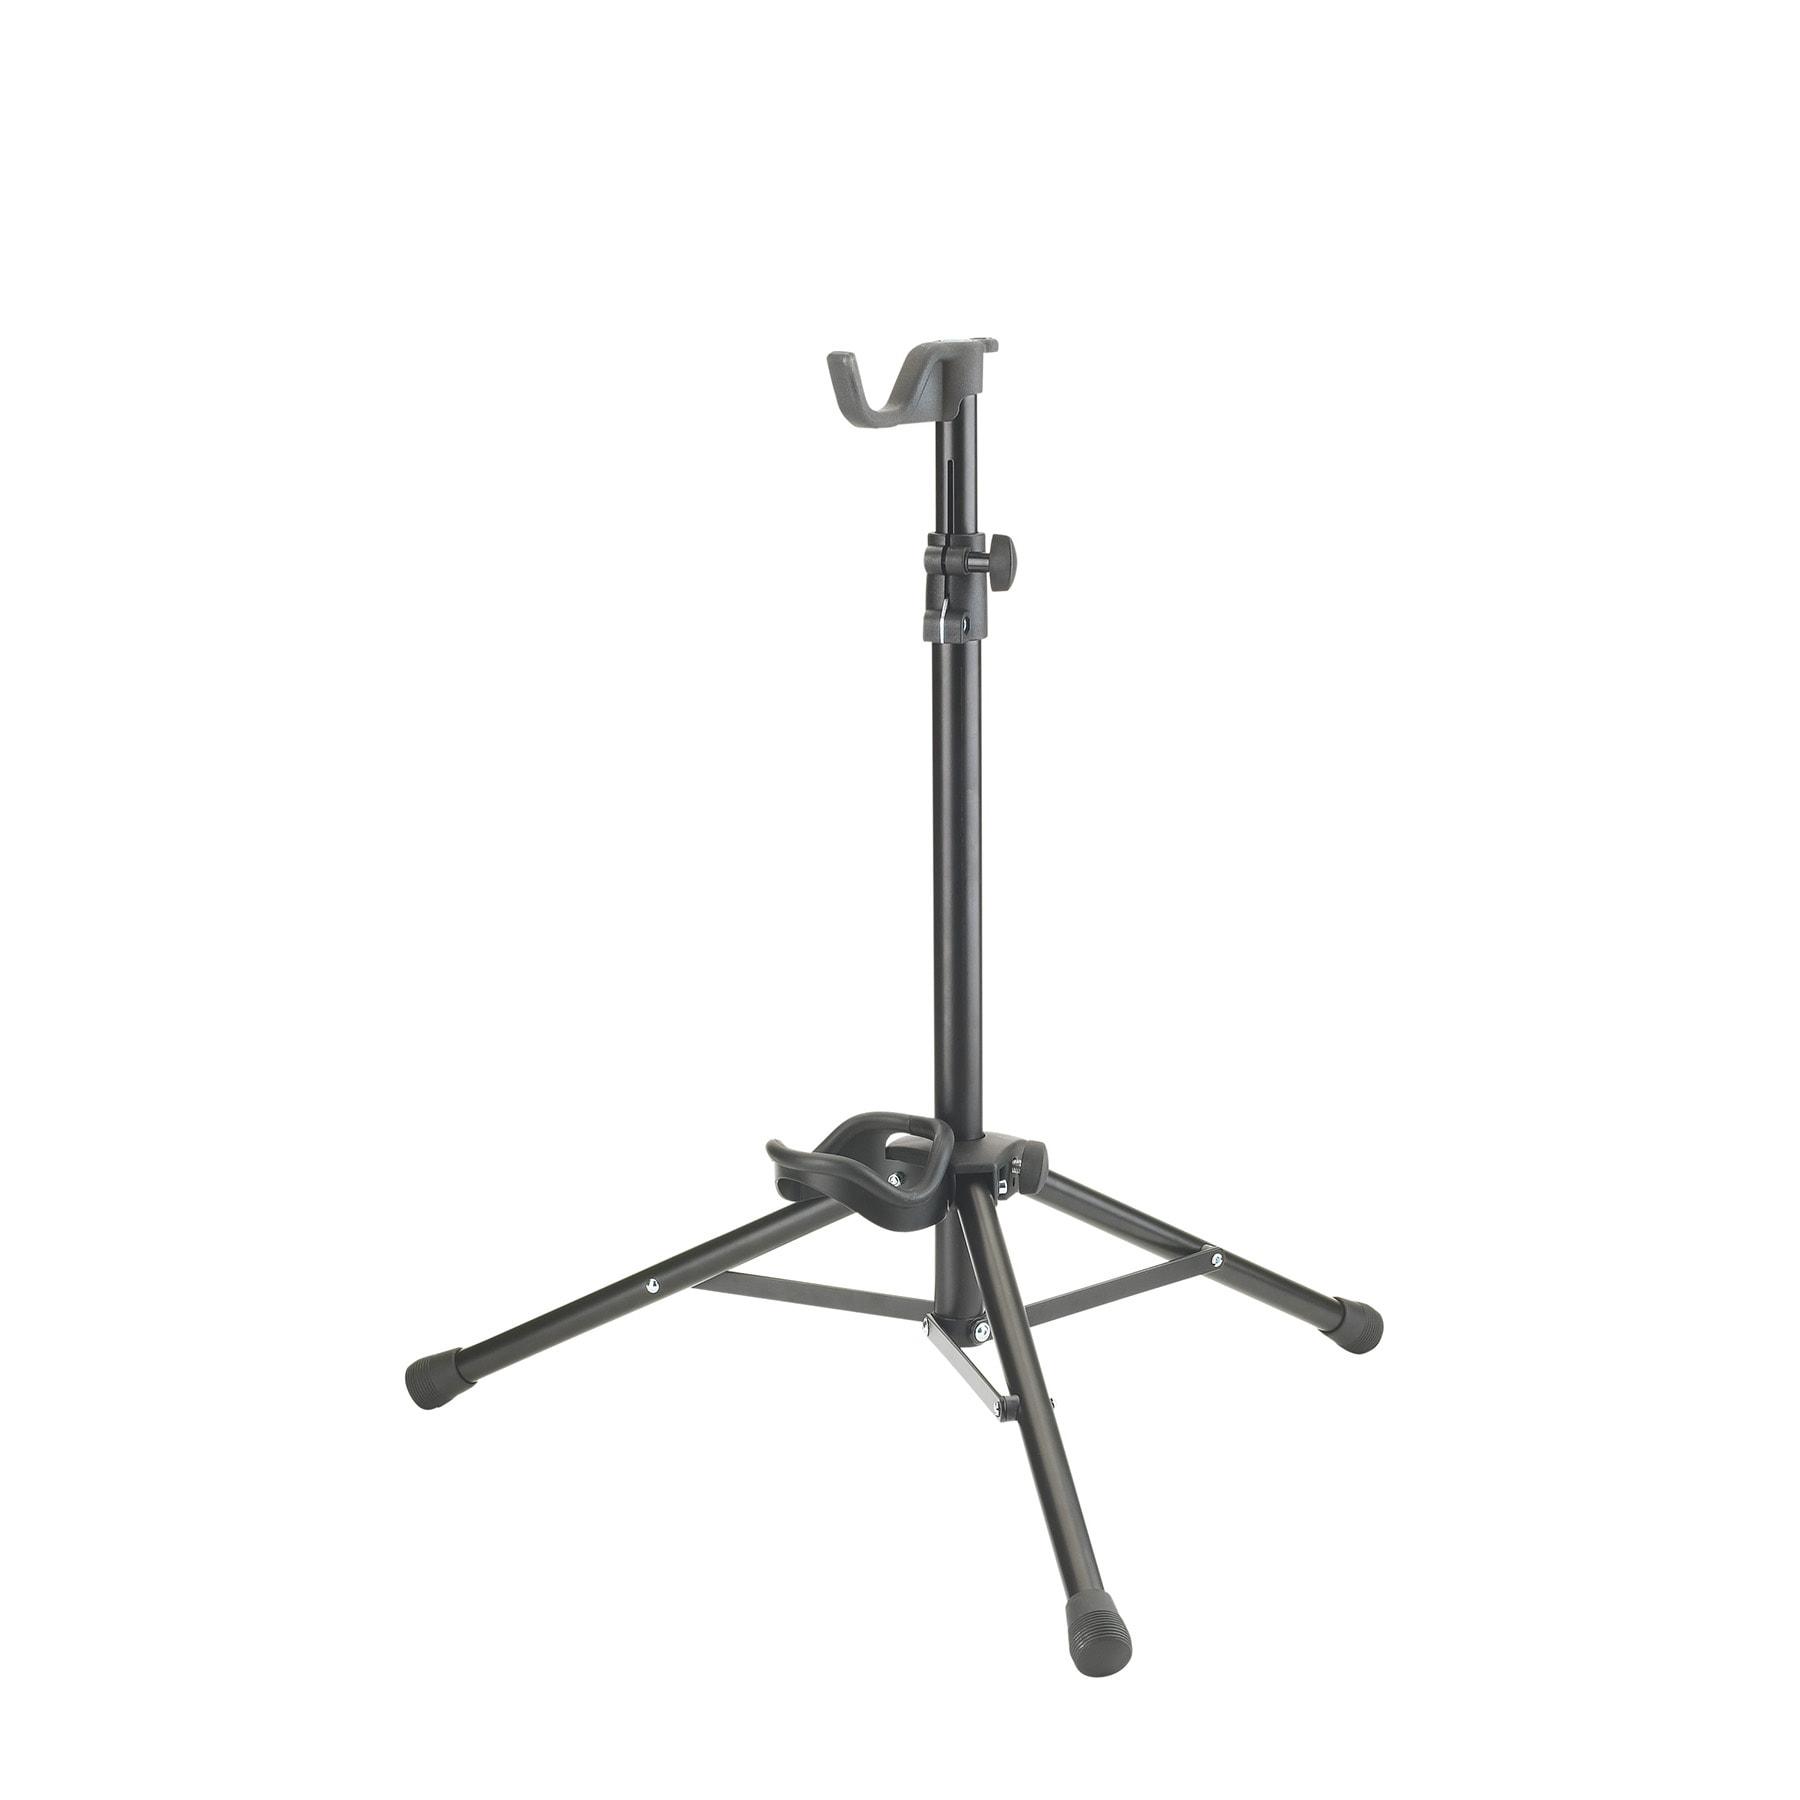 KM149_2 - Tenor horn stand